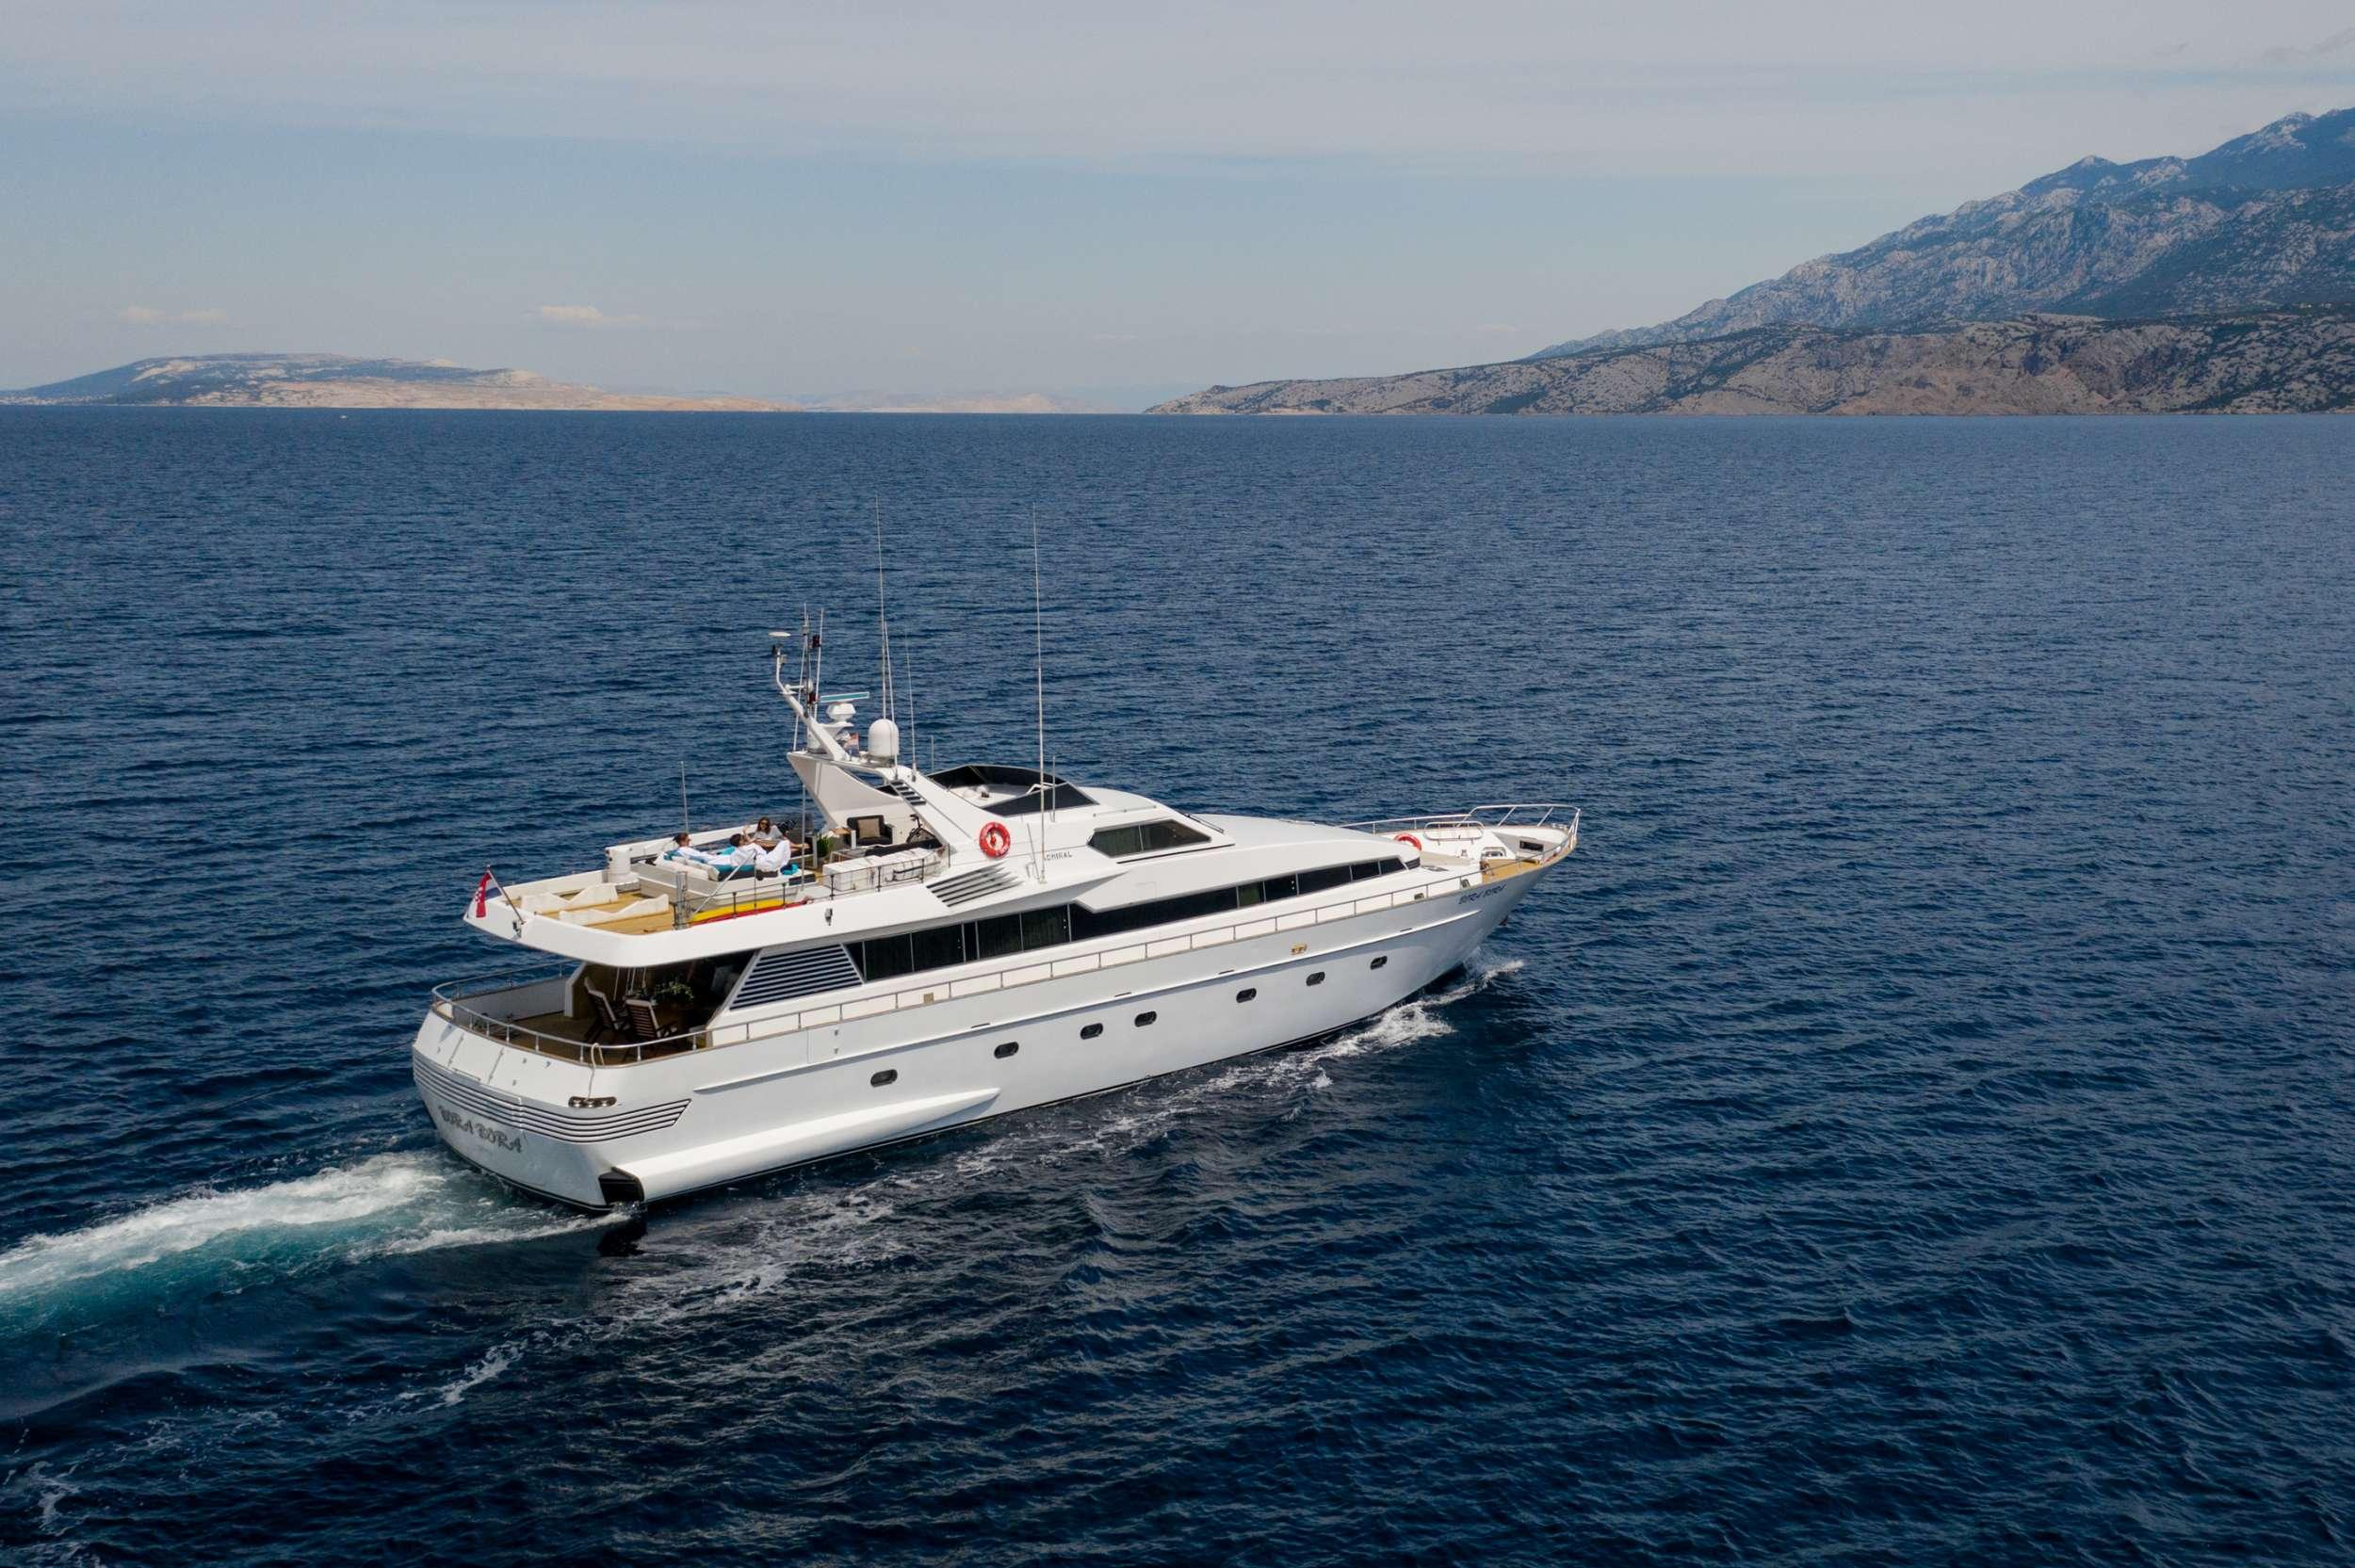 Image of Bora Bora yacht #2